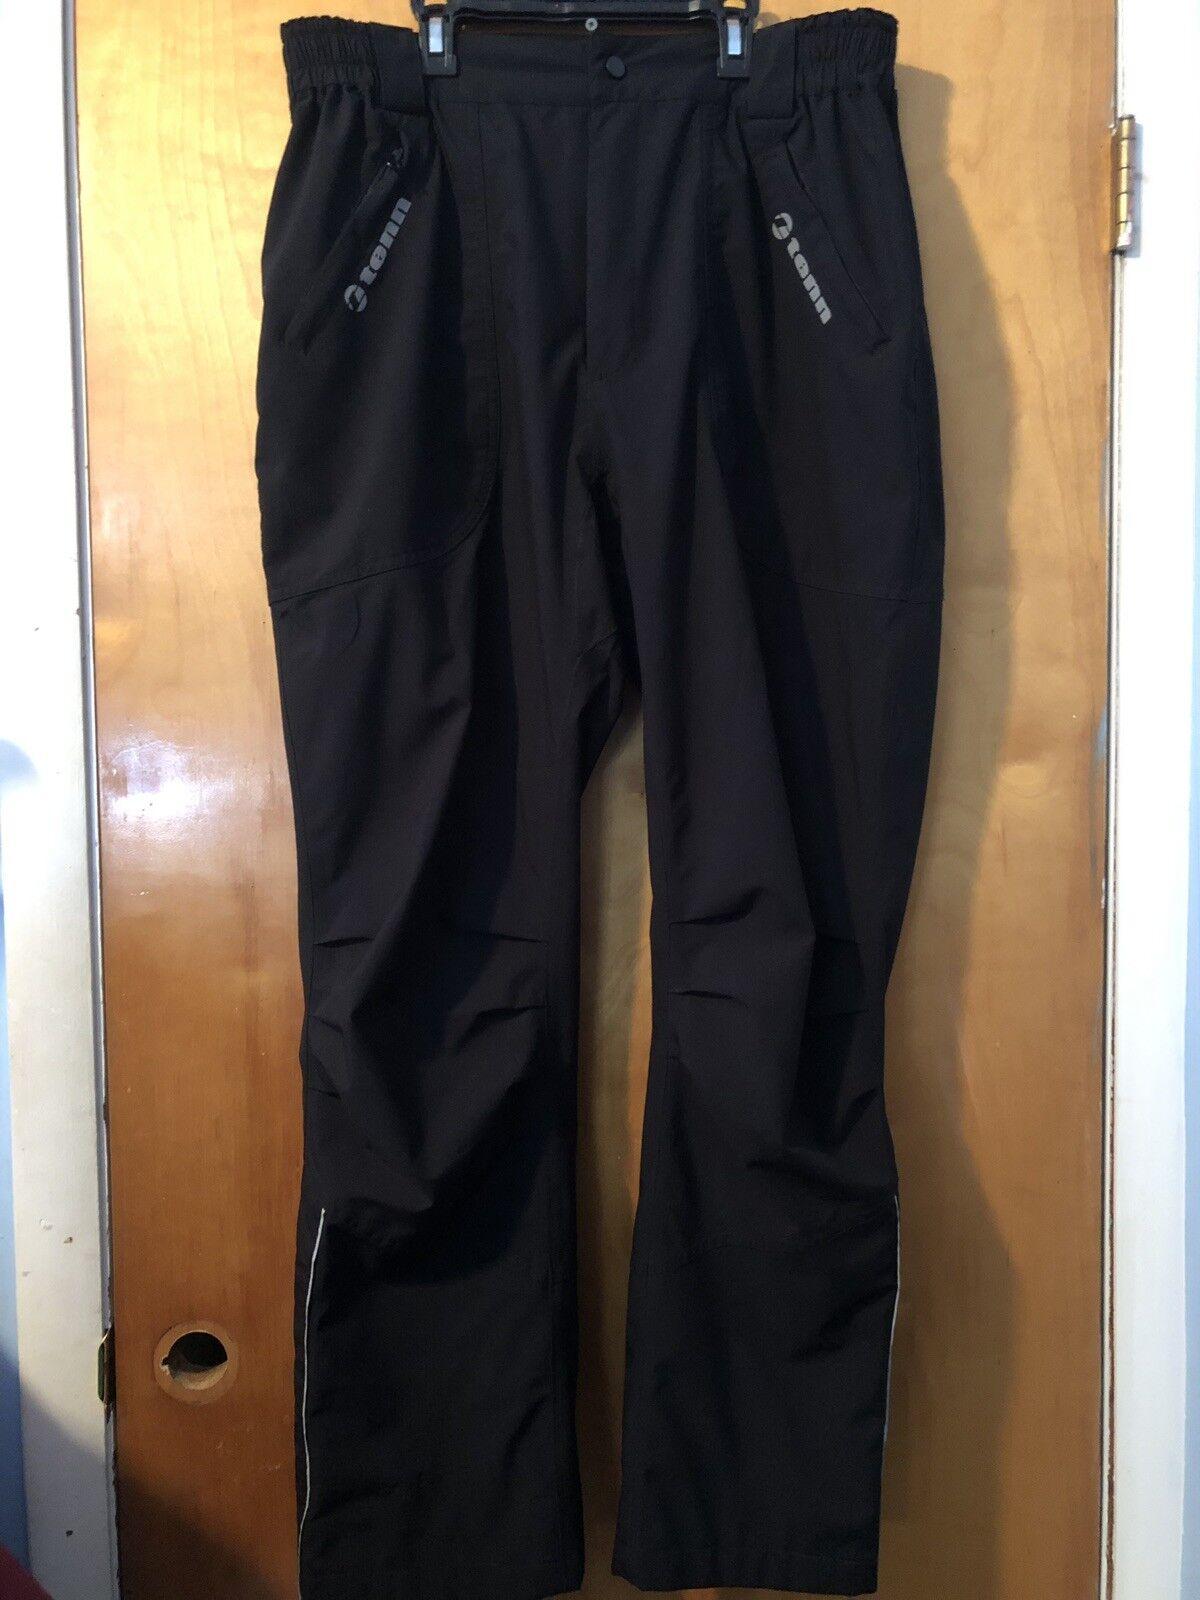 Tenn Outdoors Waterproof Pants Mens XXL 38-40 Road Trail Bike Cycling